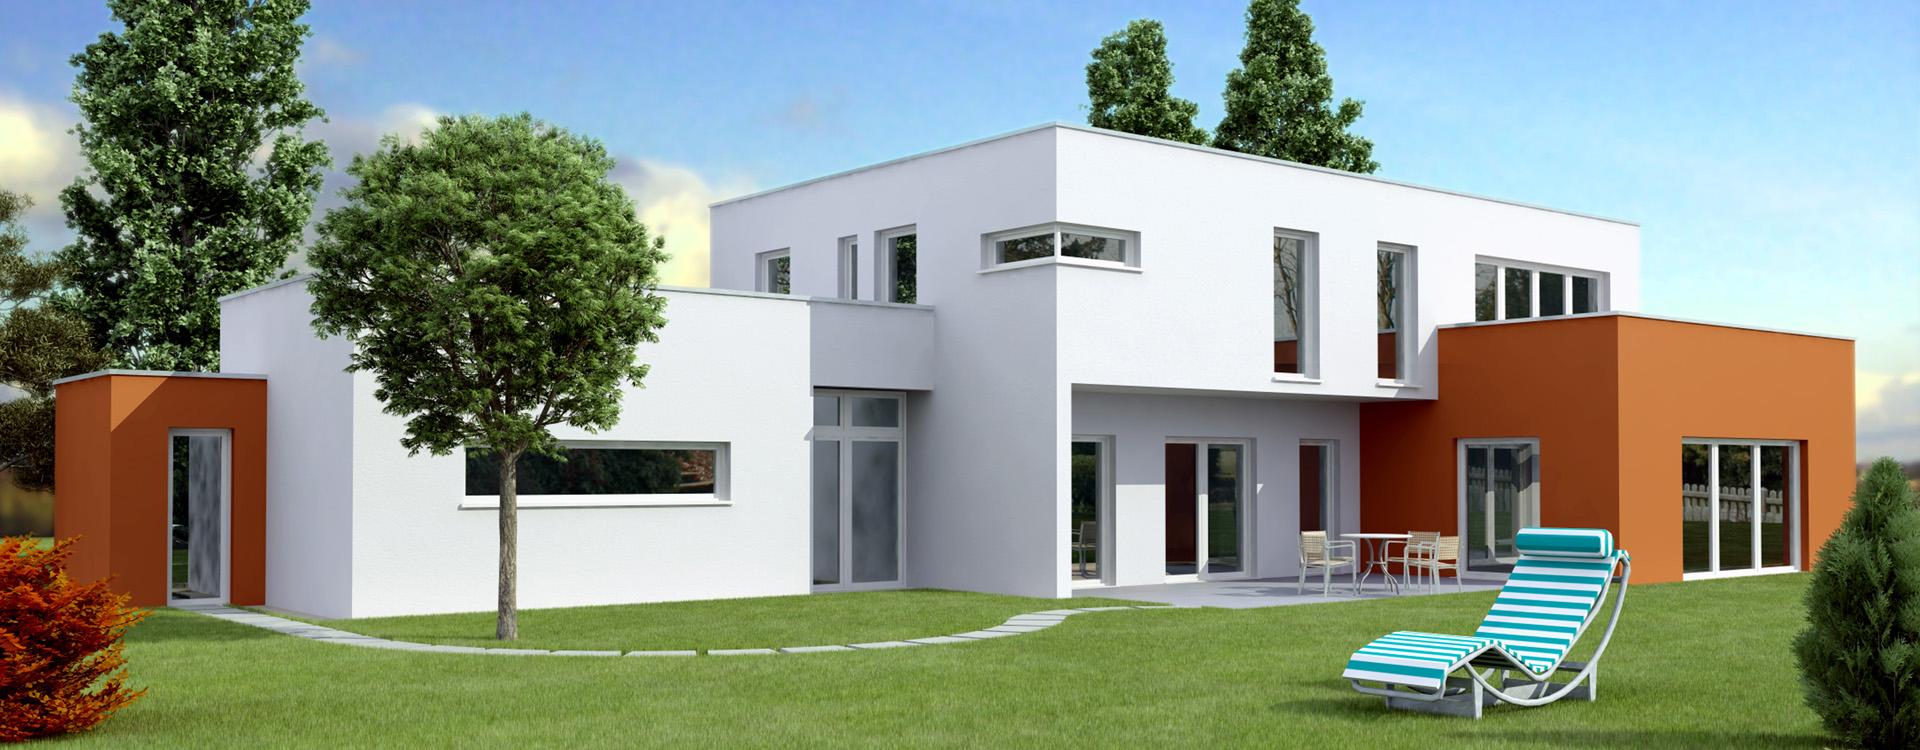 unternehmen. Black Bedroom Furniture Sets. Home Design Ideas